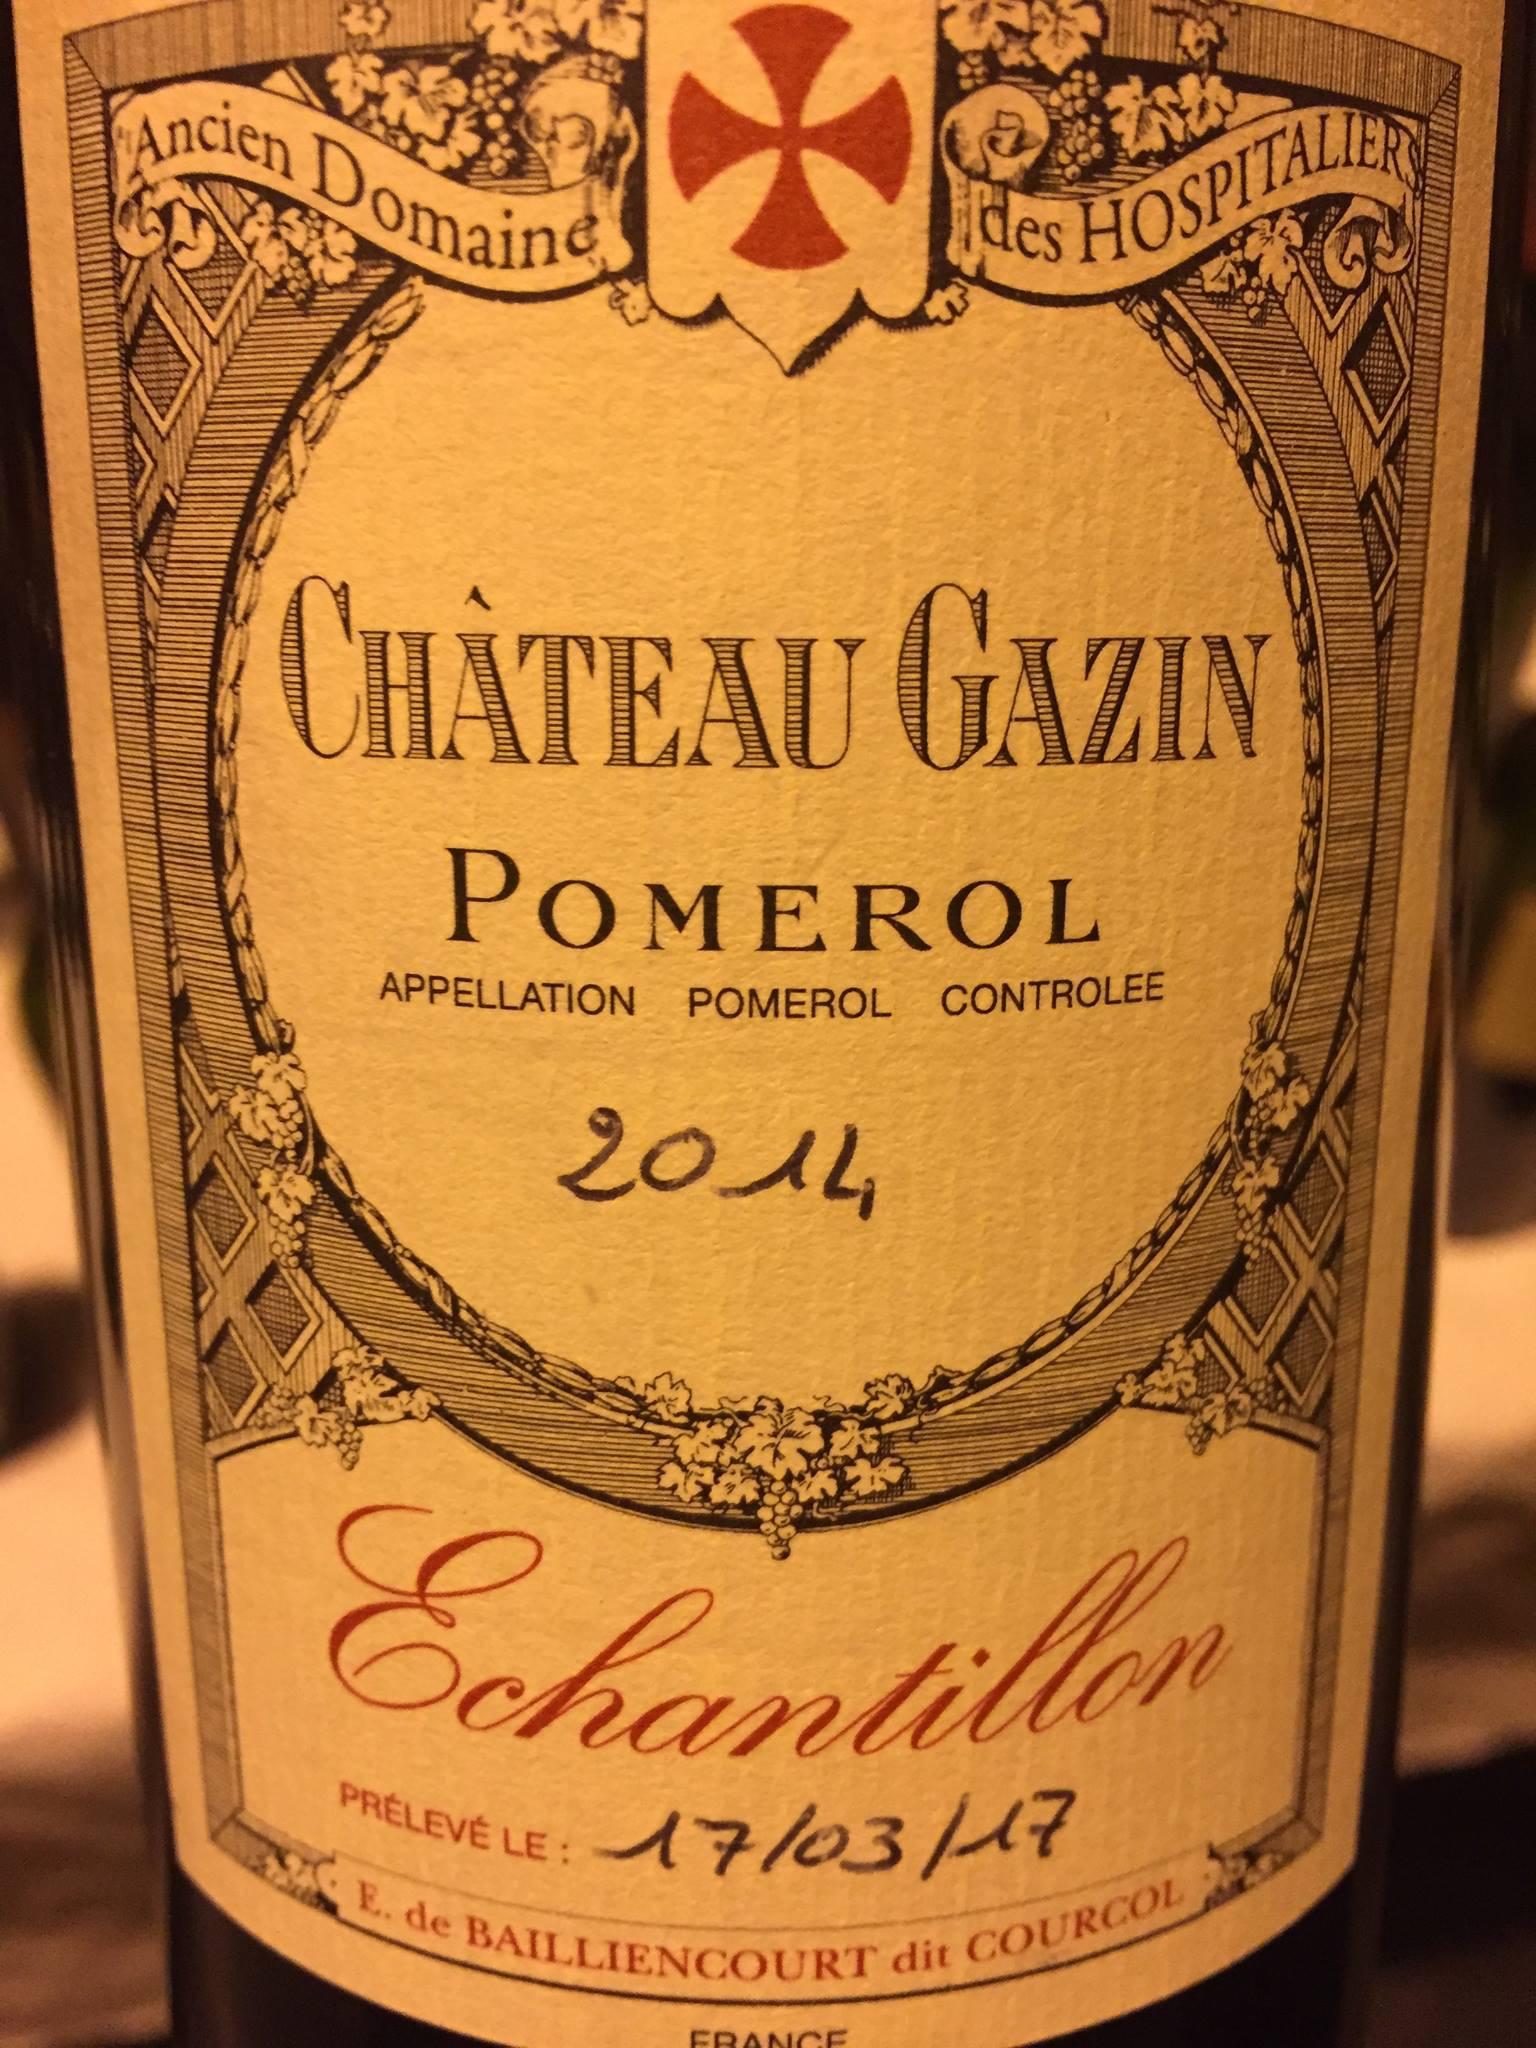 Château Gazin 2014 – Pomerol